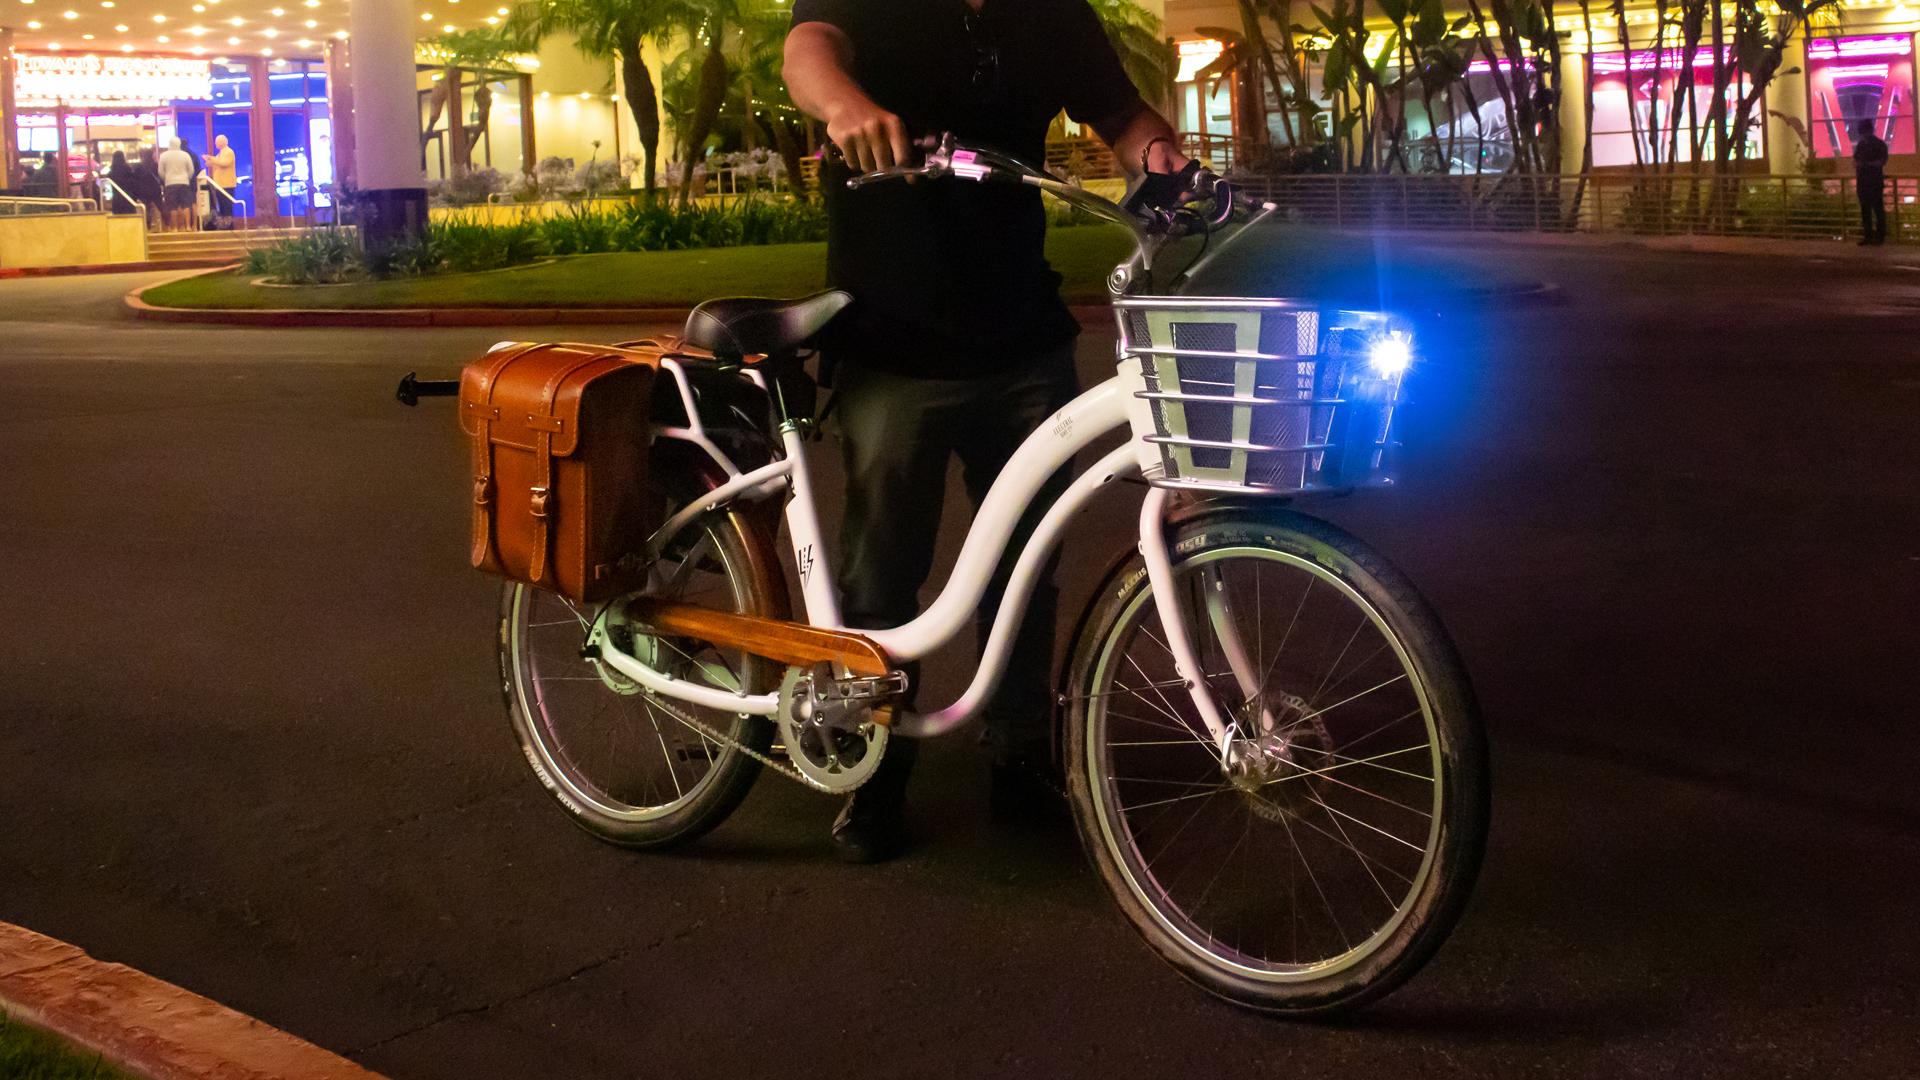 electrified-reviews-electric-bike-company-model-s-electric-bike-review-hero.jpg